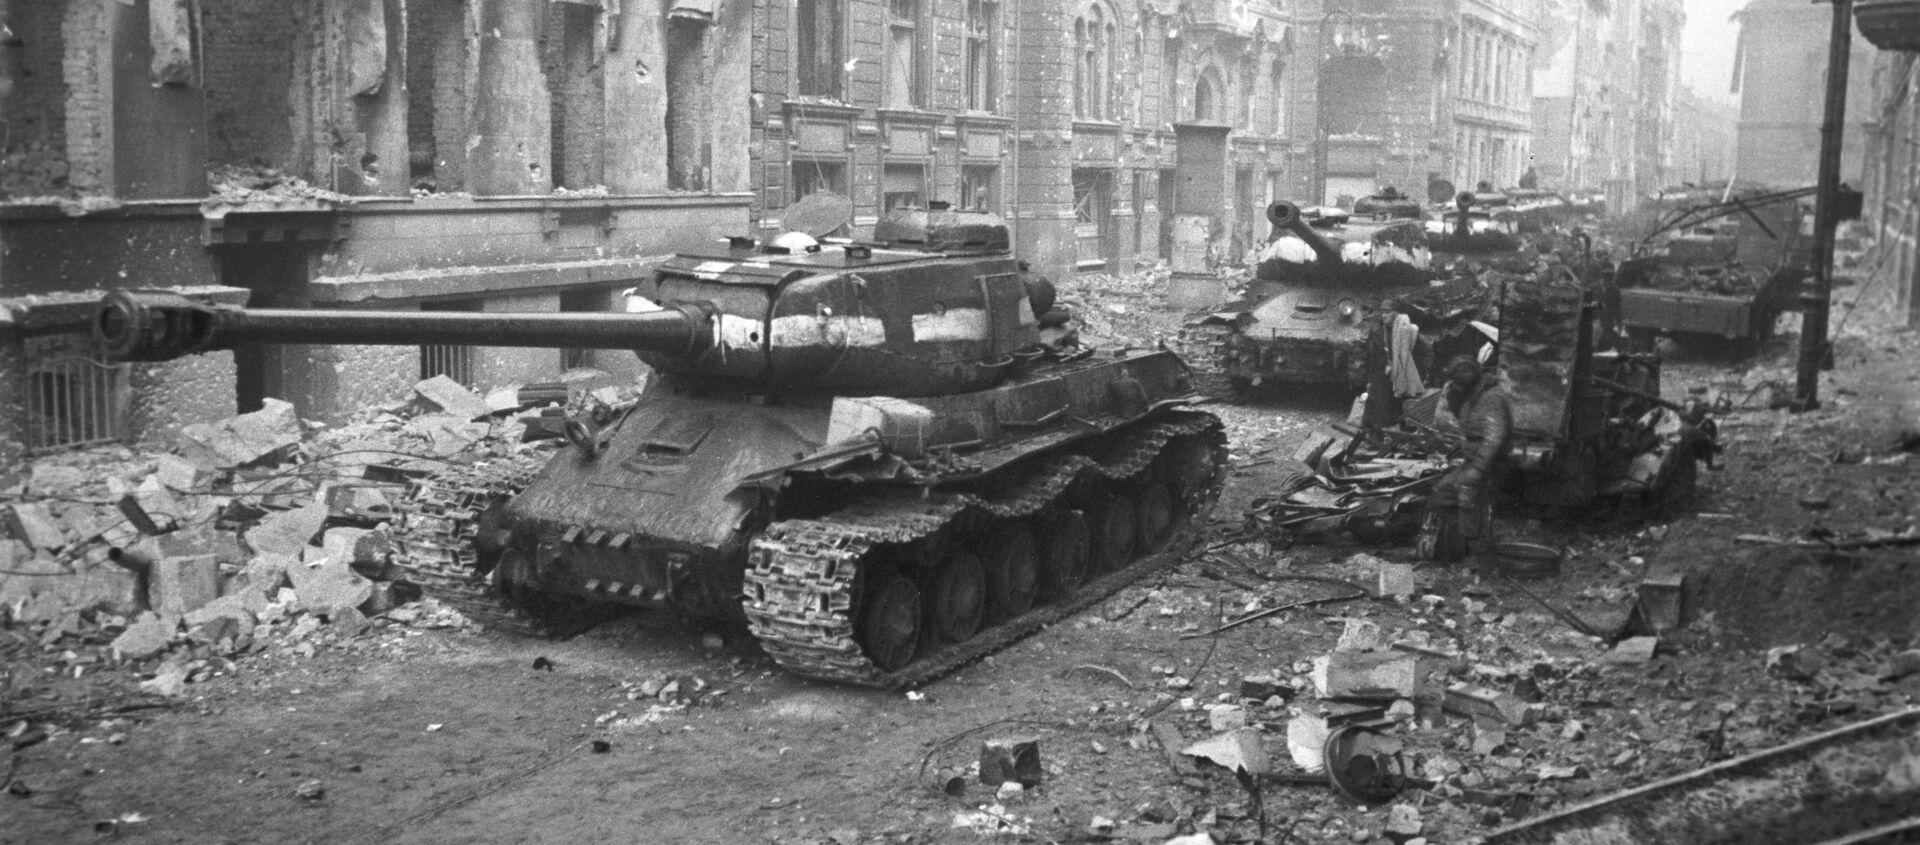 Radzieckie czołgi na ulicach Berlina, 1945 r. - Sputnik Polska, 1920, 05.05.2021